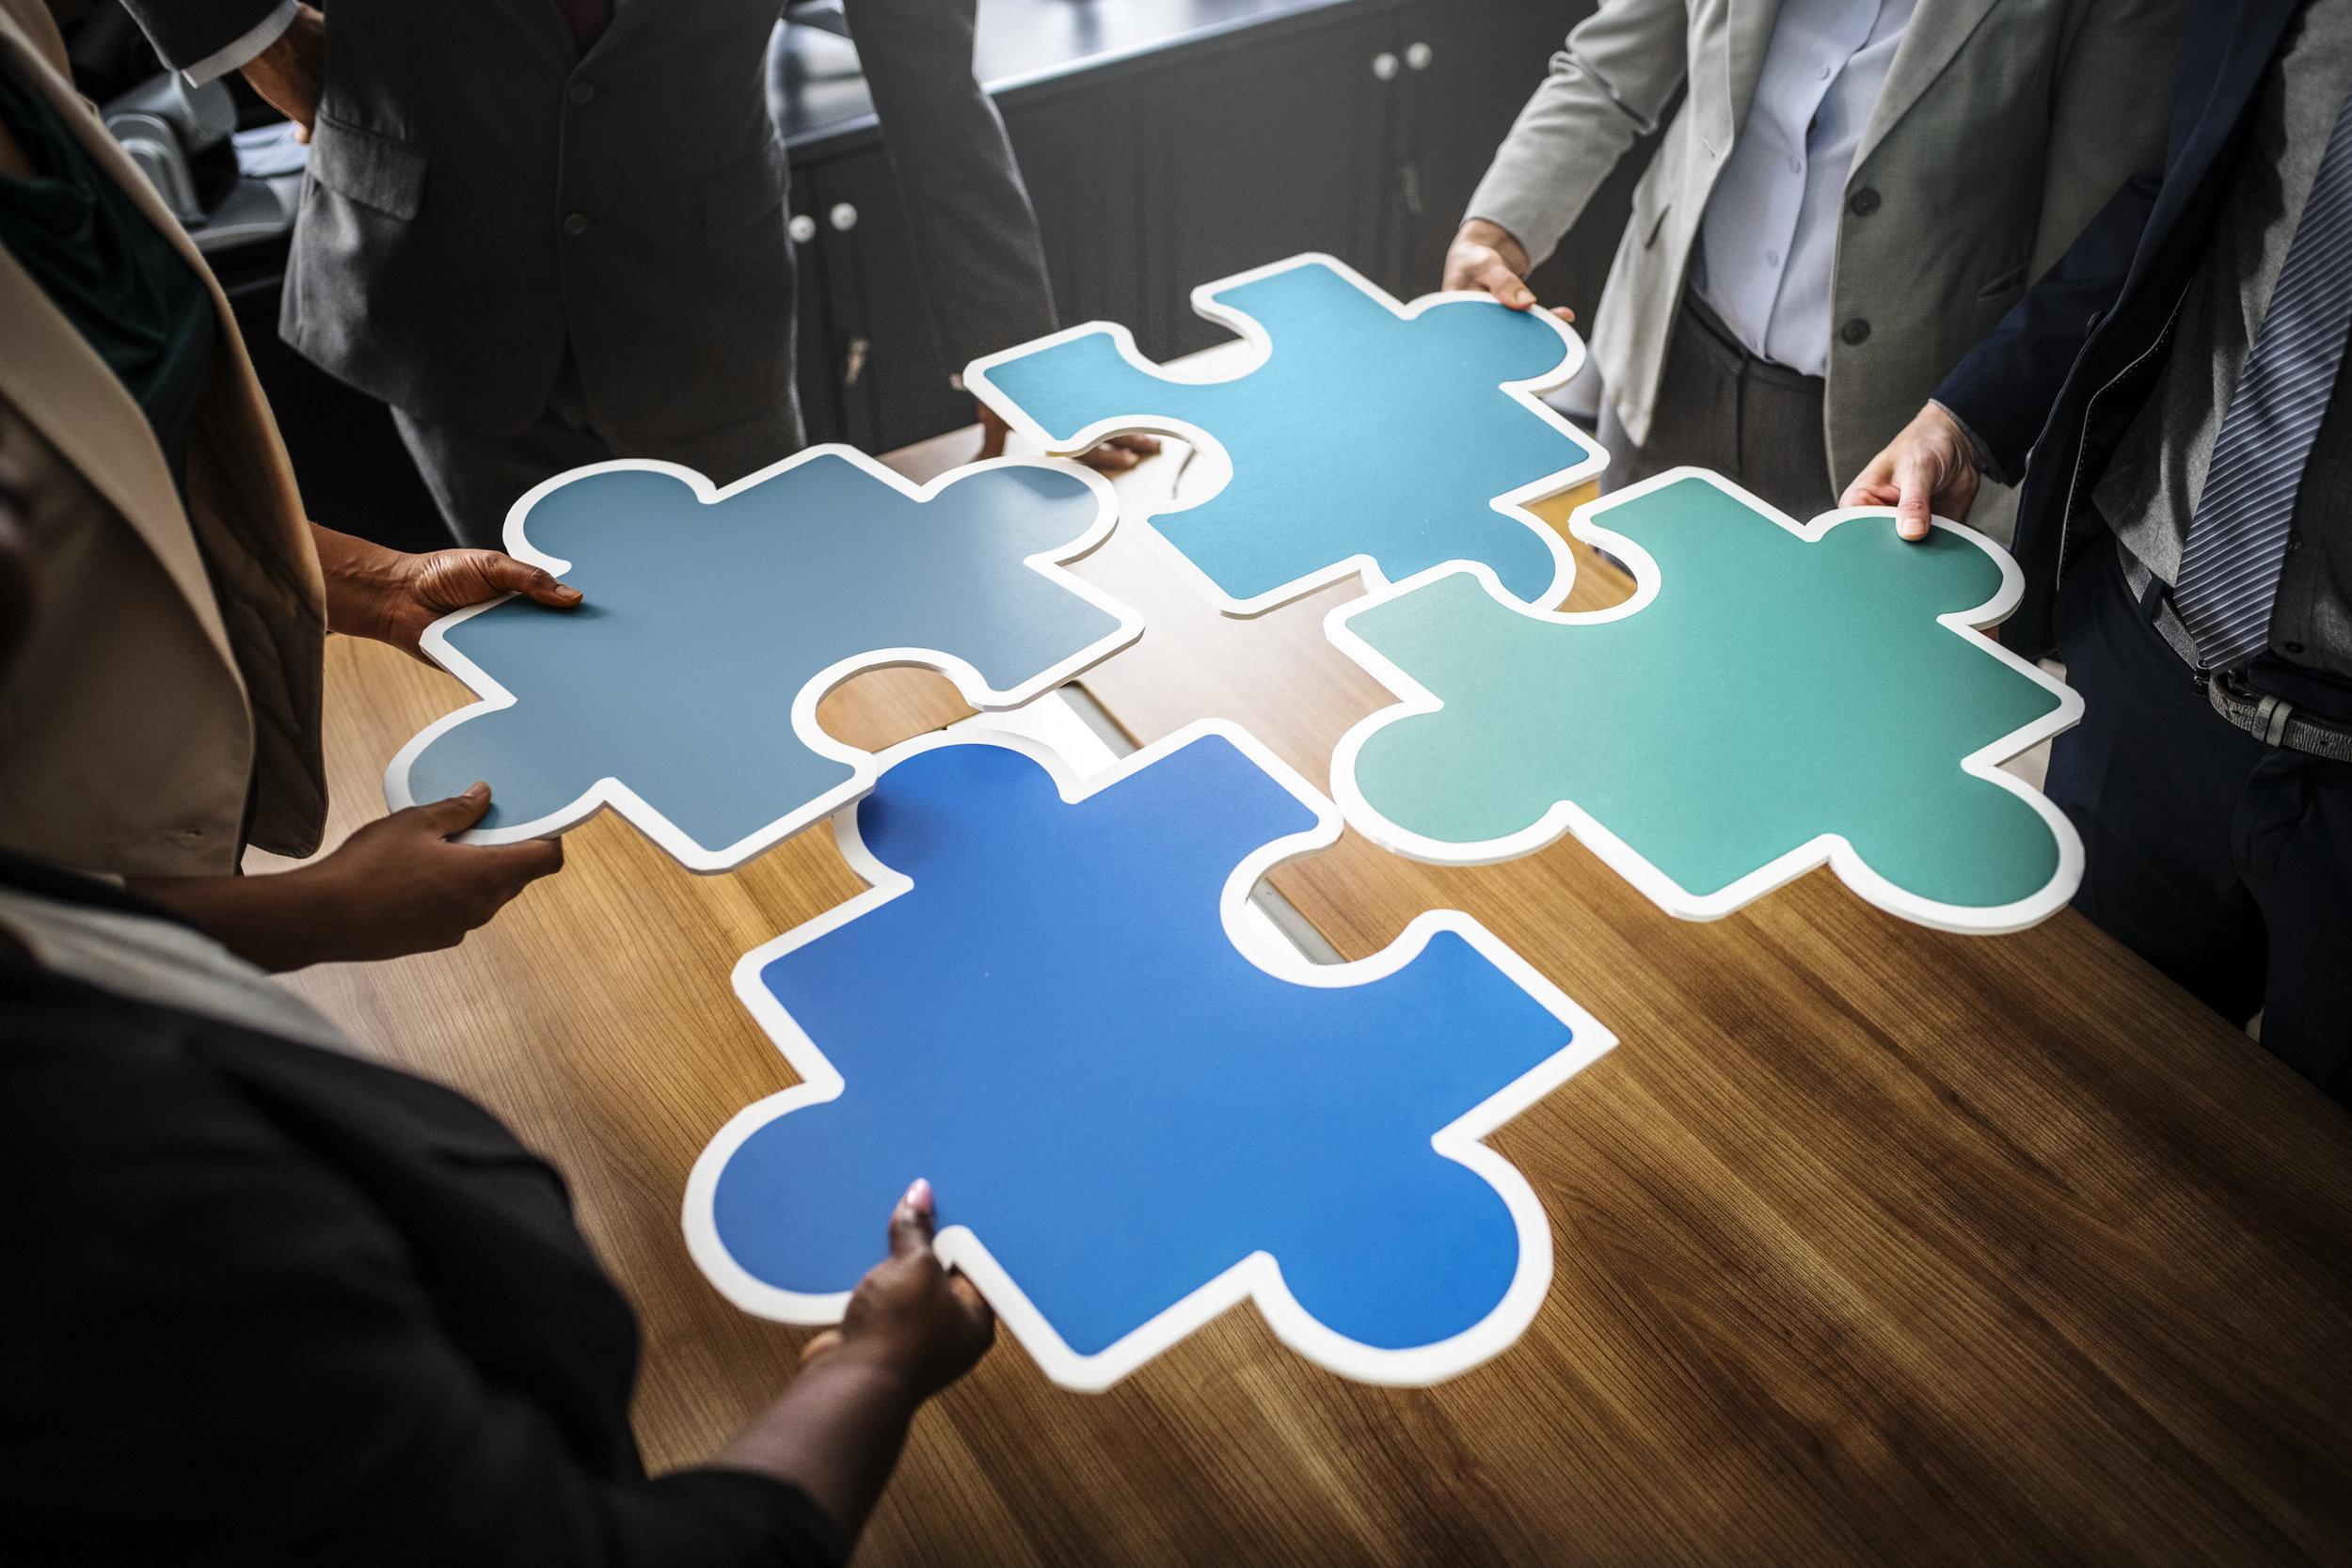 business-team-development-law-of-addition-minneapolis.jpg